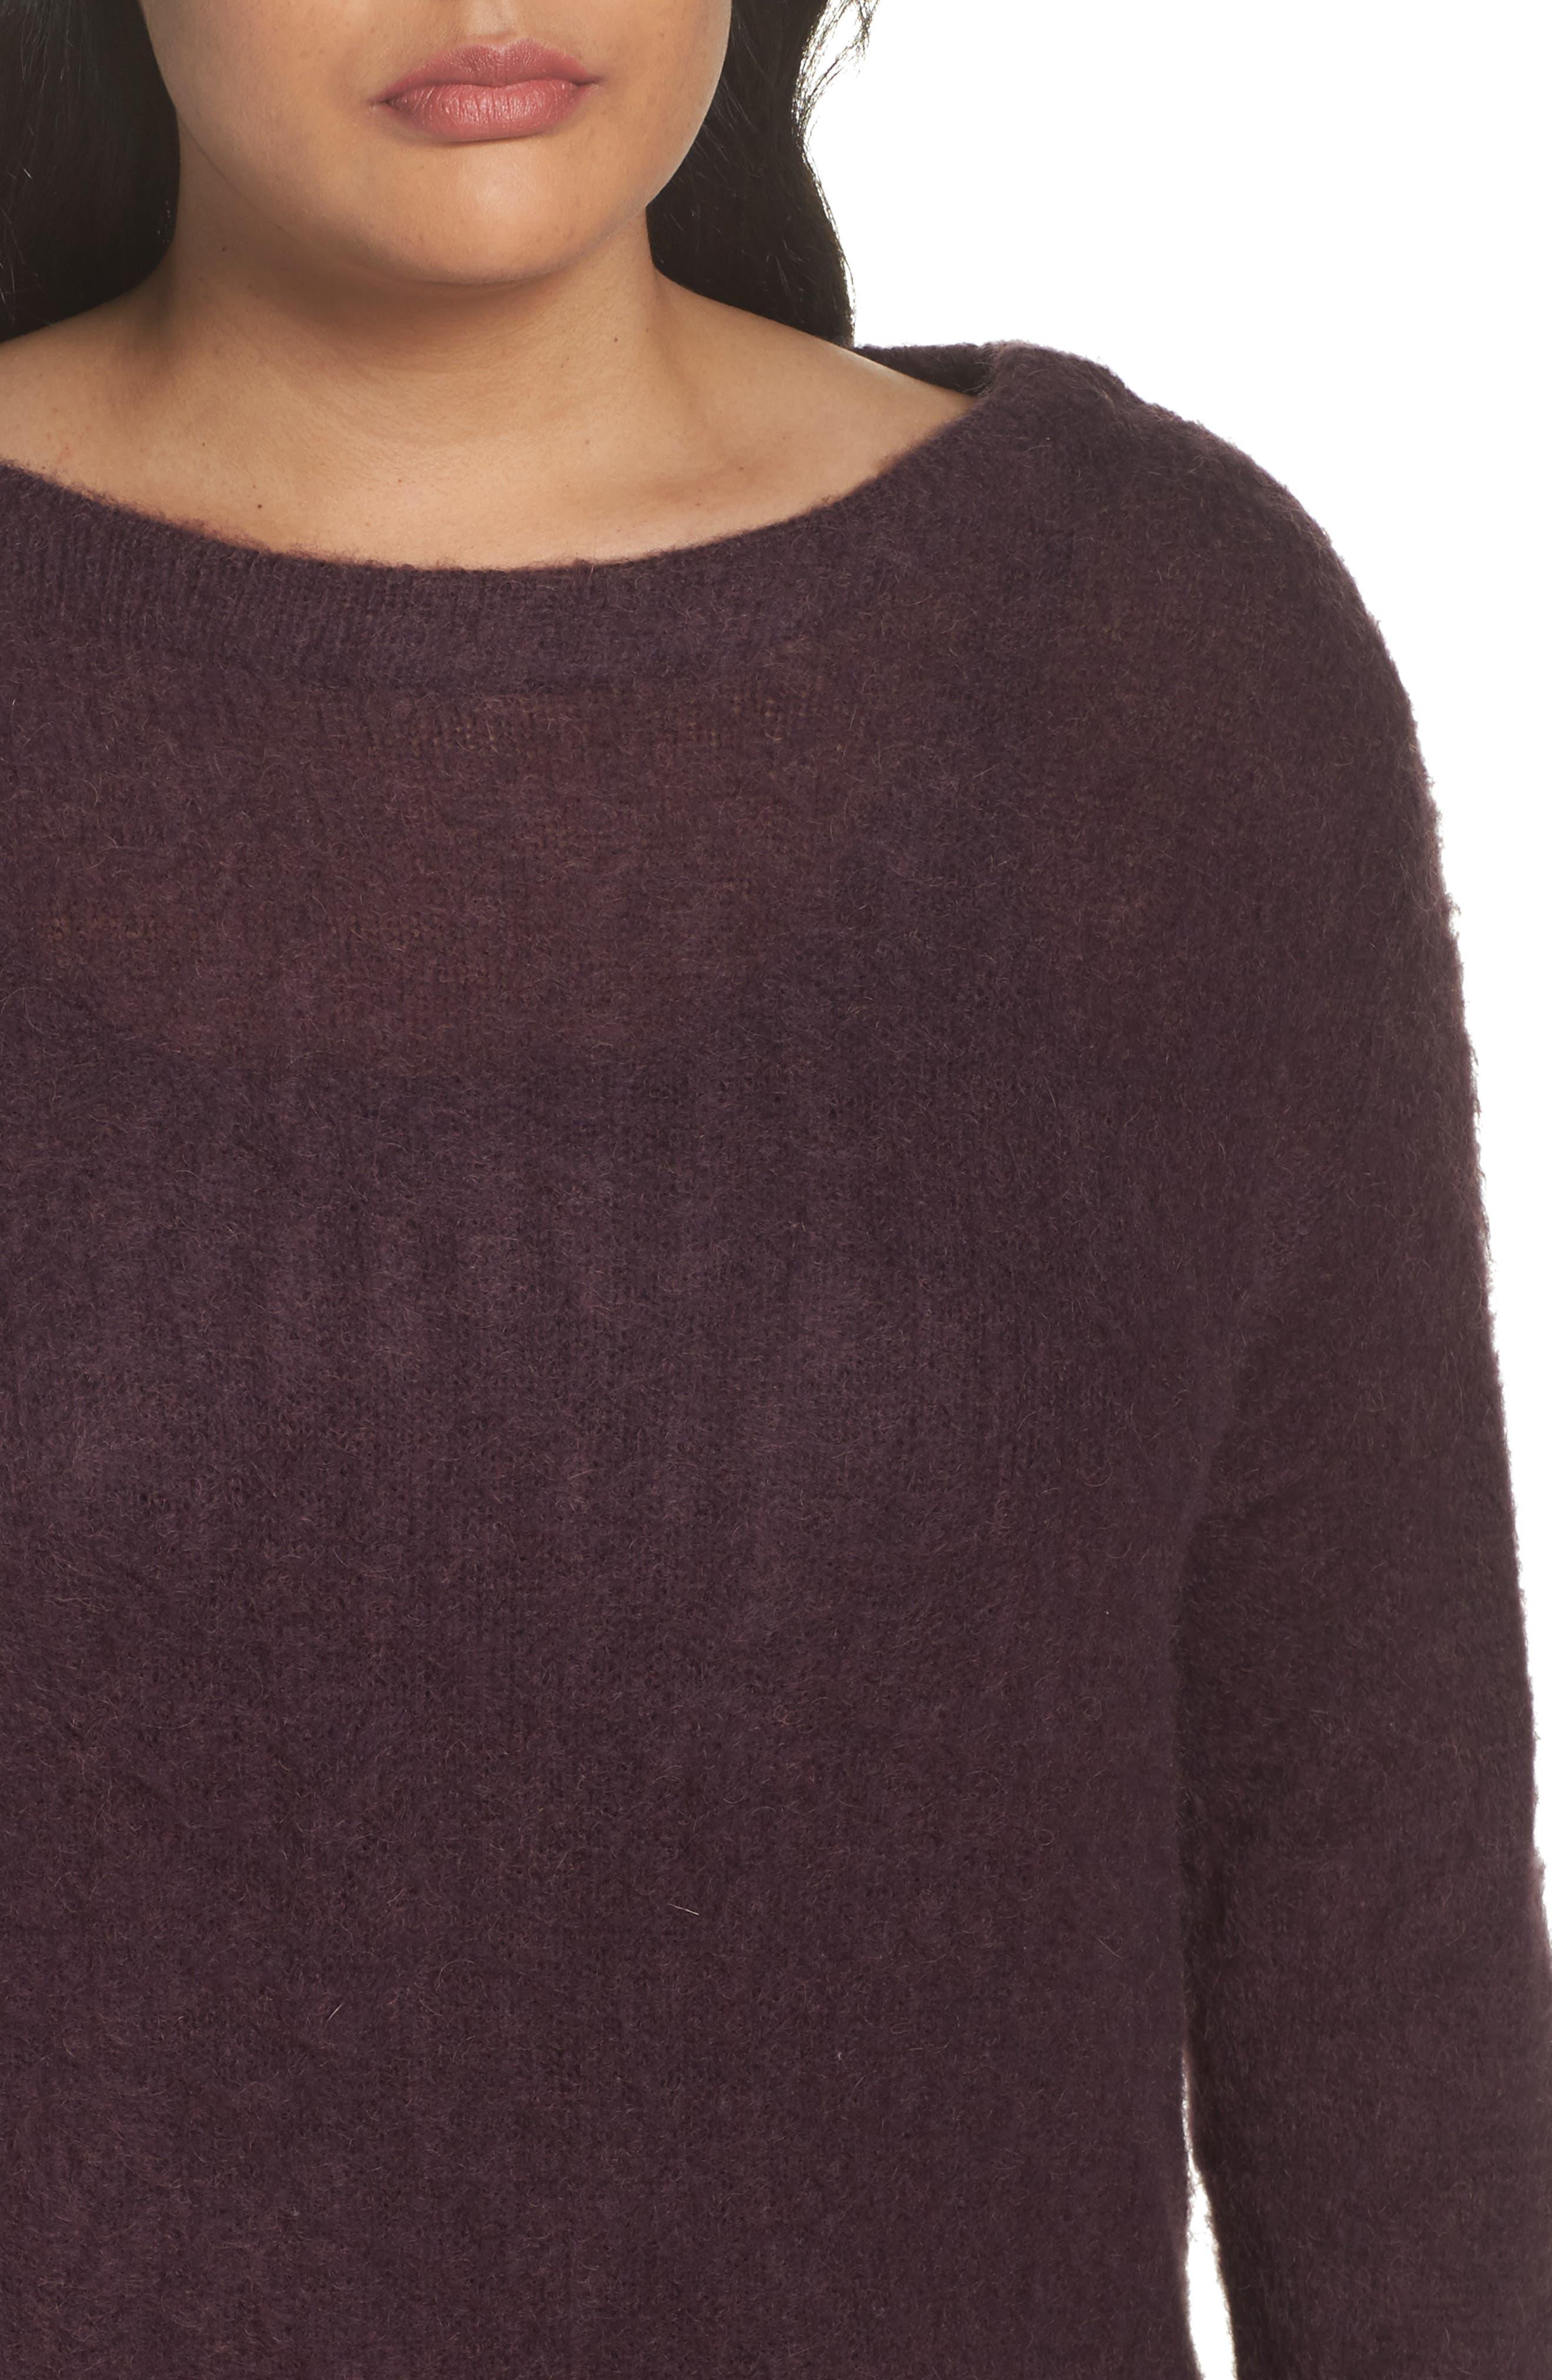 Long Sleeve Brushed Sweater,                             Alternate thumbnail 4, color,                             Purple Plum